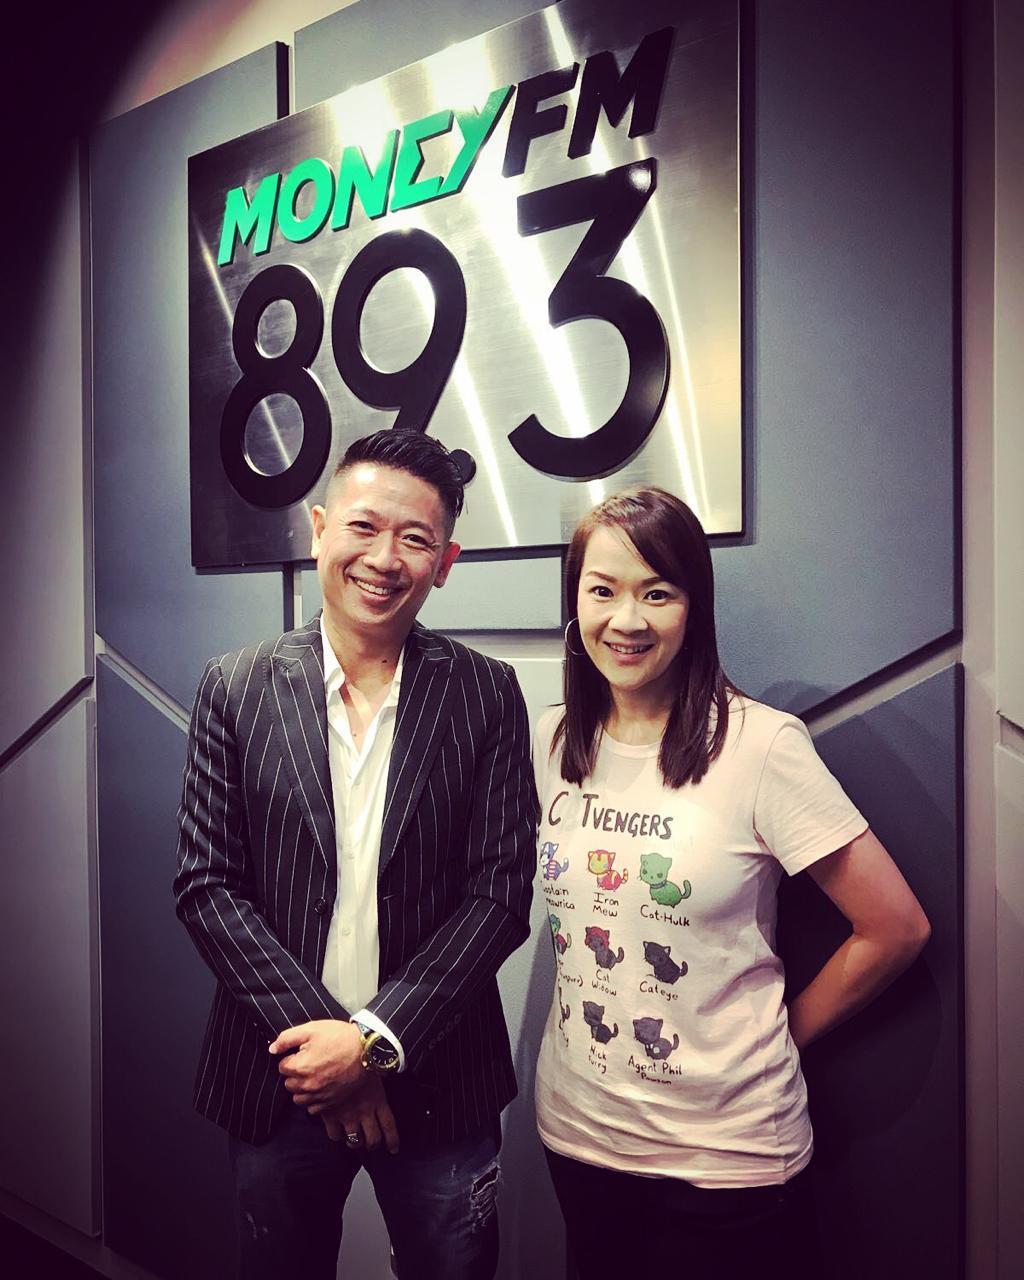 MONEY FM 89.3 RADIO INTERVIEW